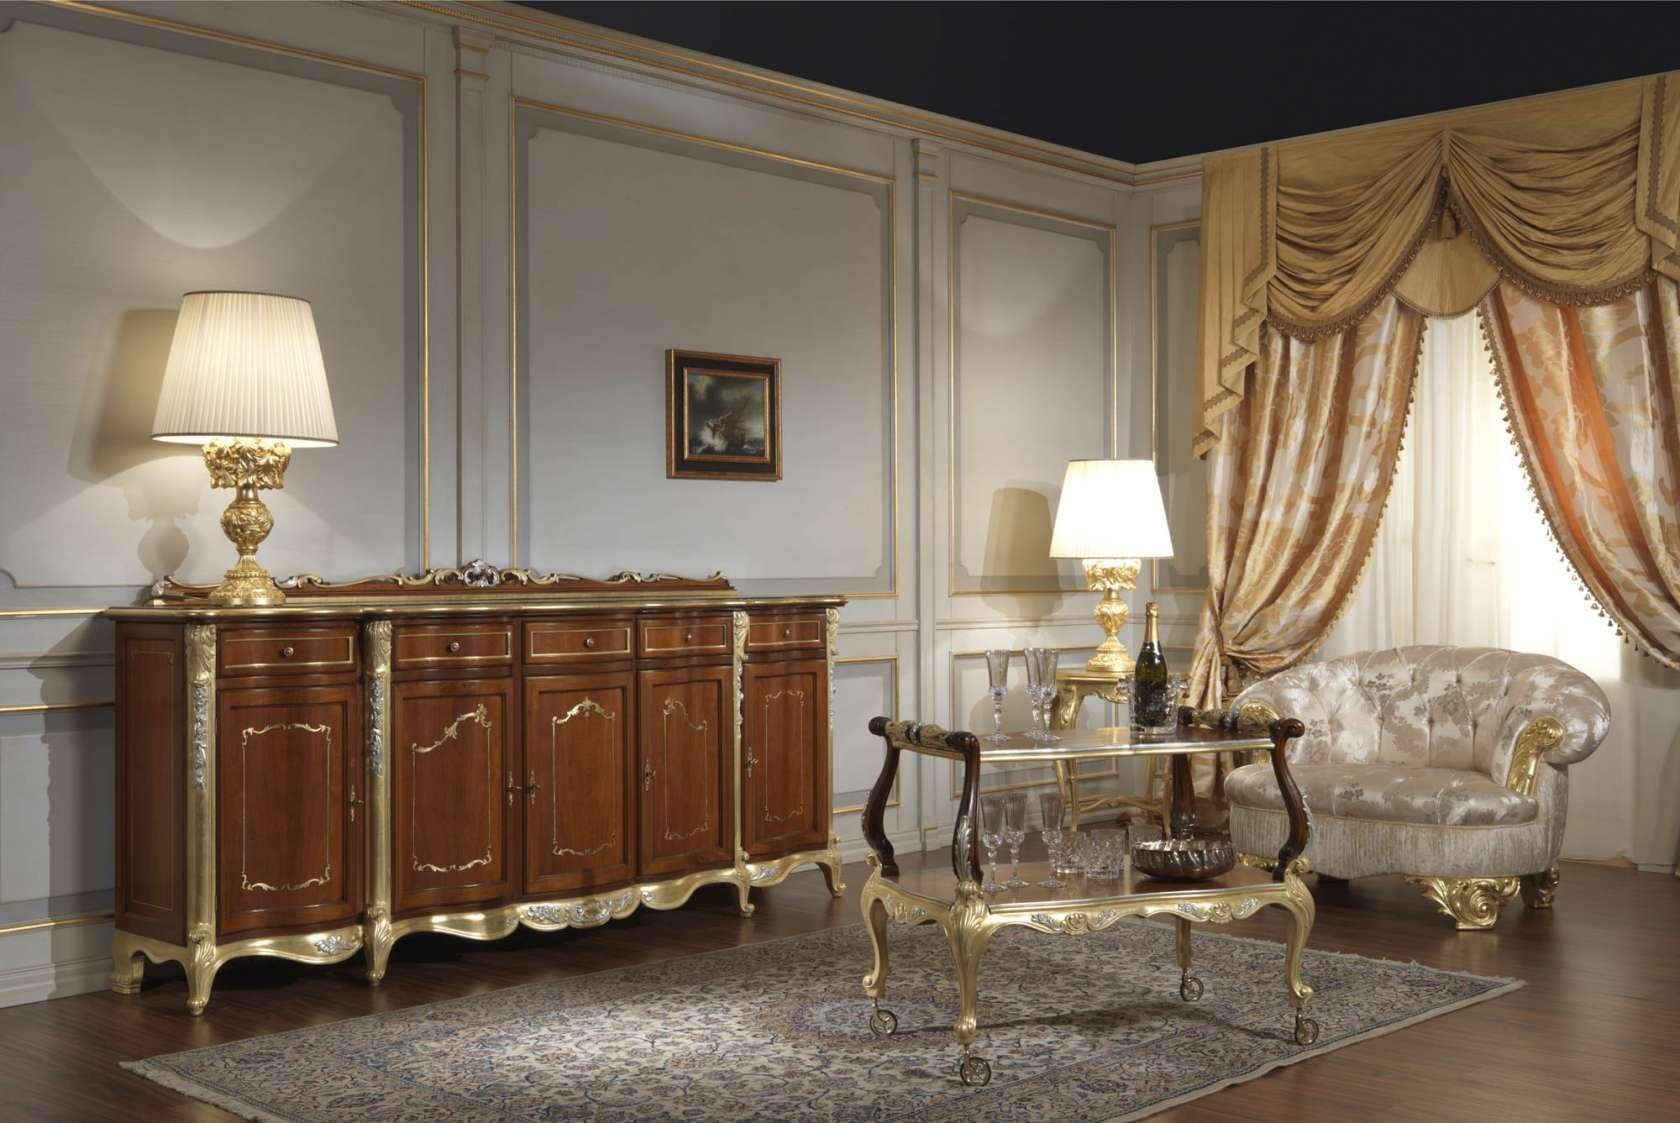 Beautiful Mobili Per Sala Da Pranzo Ideas - Idee Arredamento Casa ...